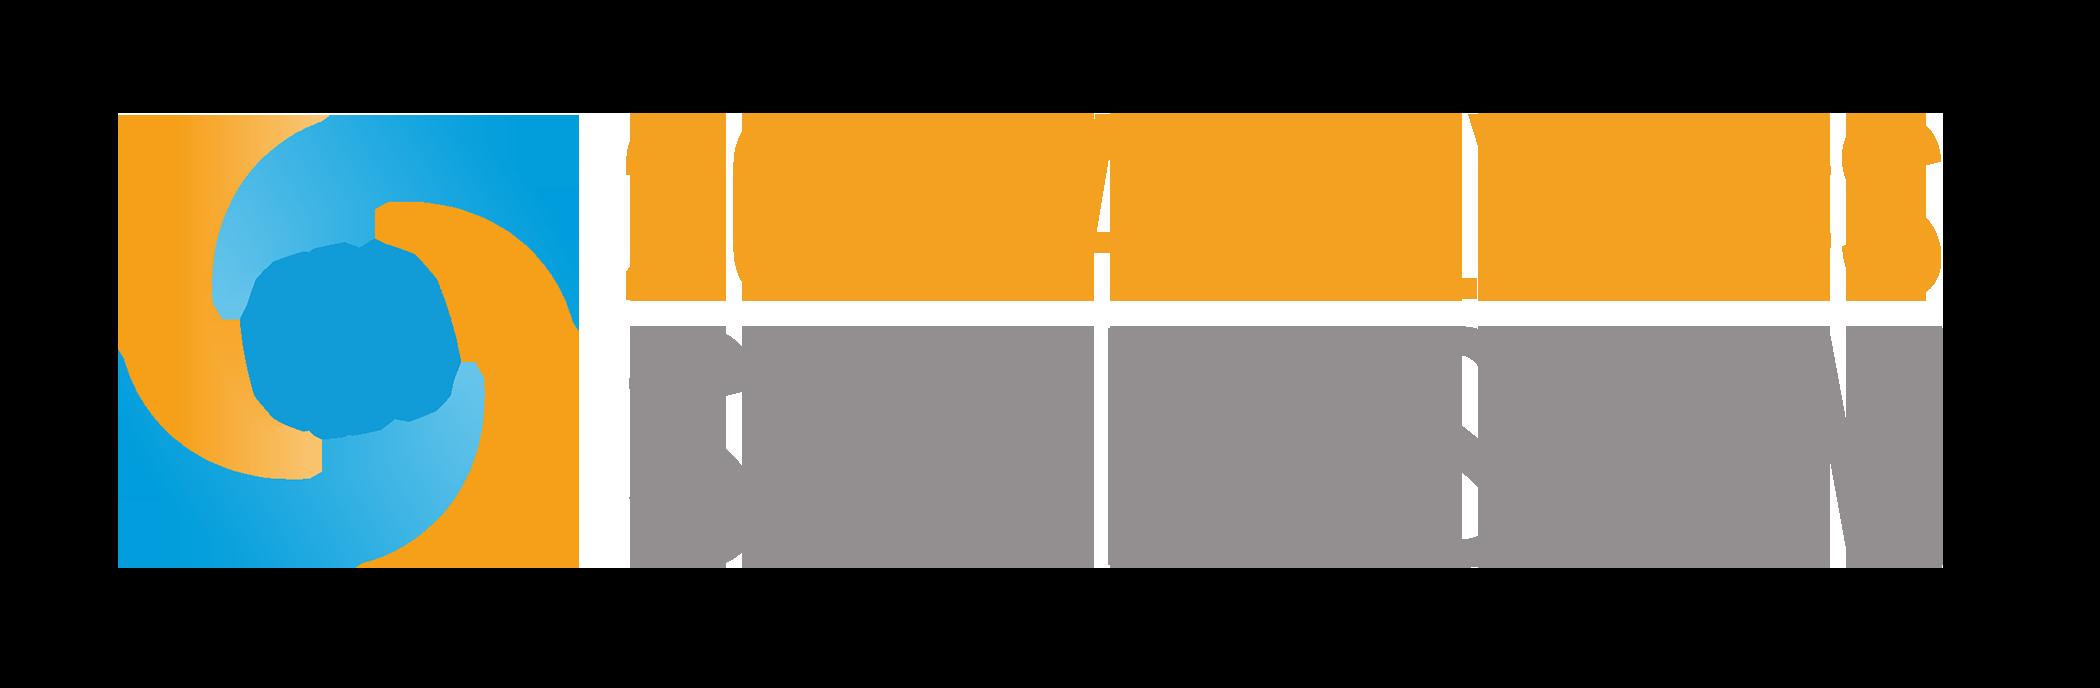 2019 logo_gray.png